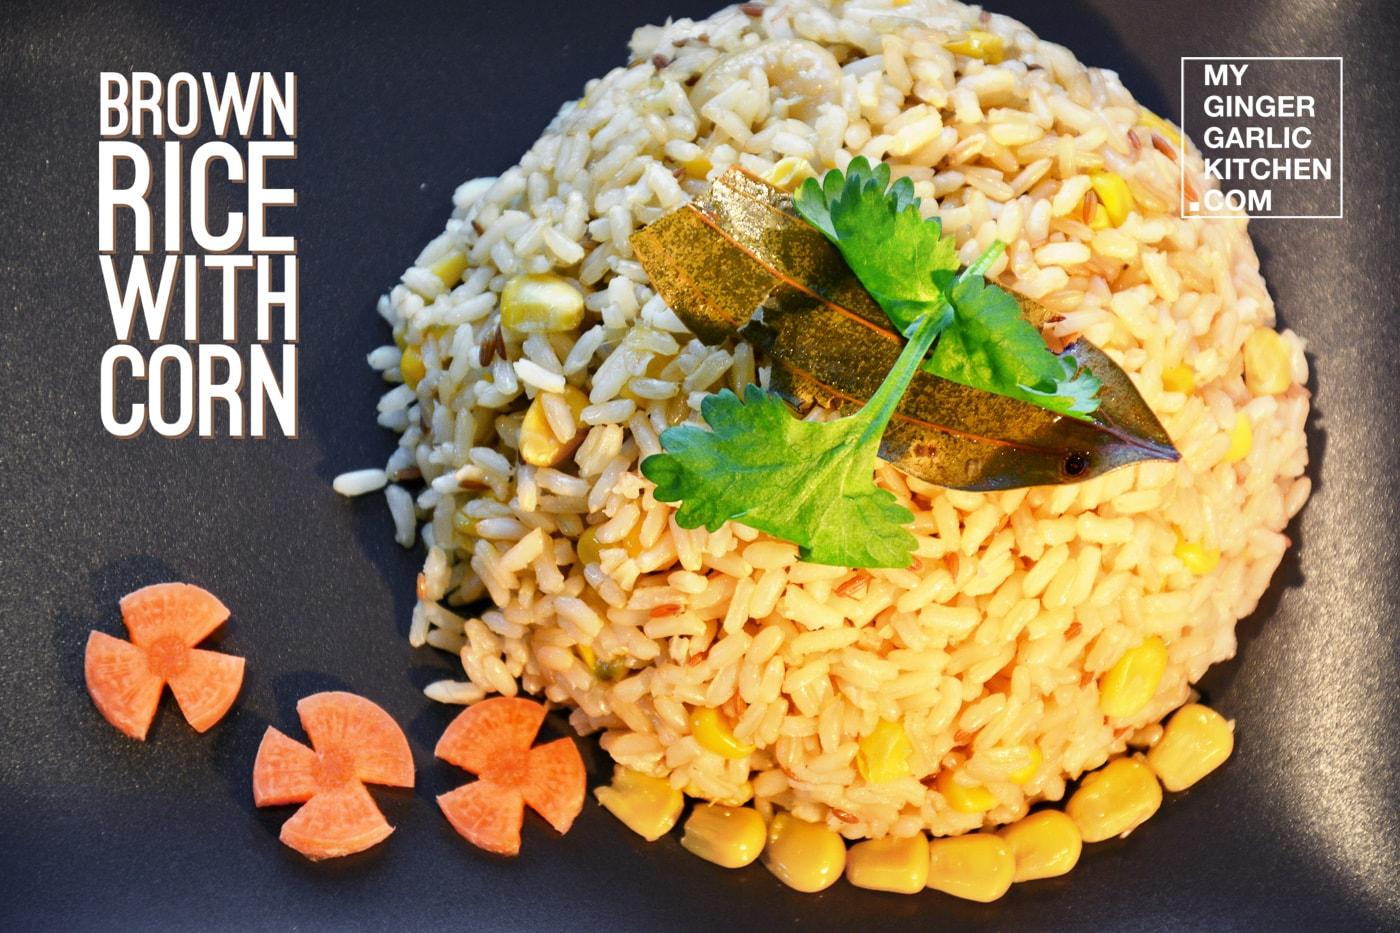 Image - recipe brown rice with corn anupama paliwal my ginger garlic kitchen 3 copy